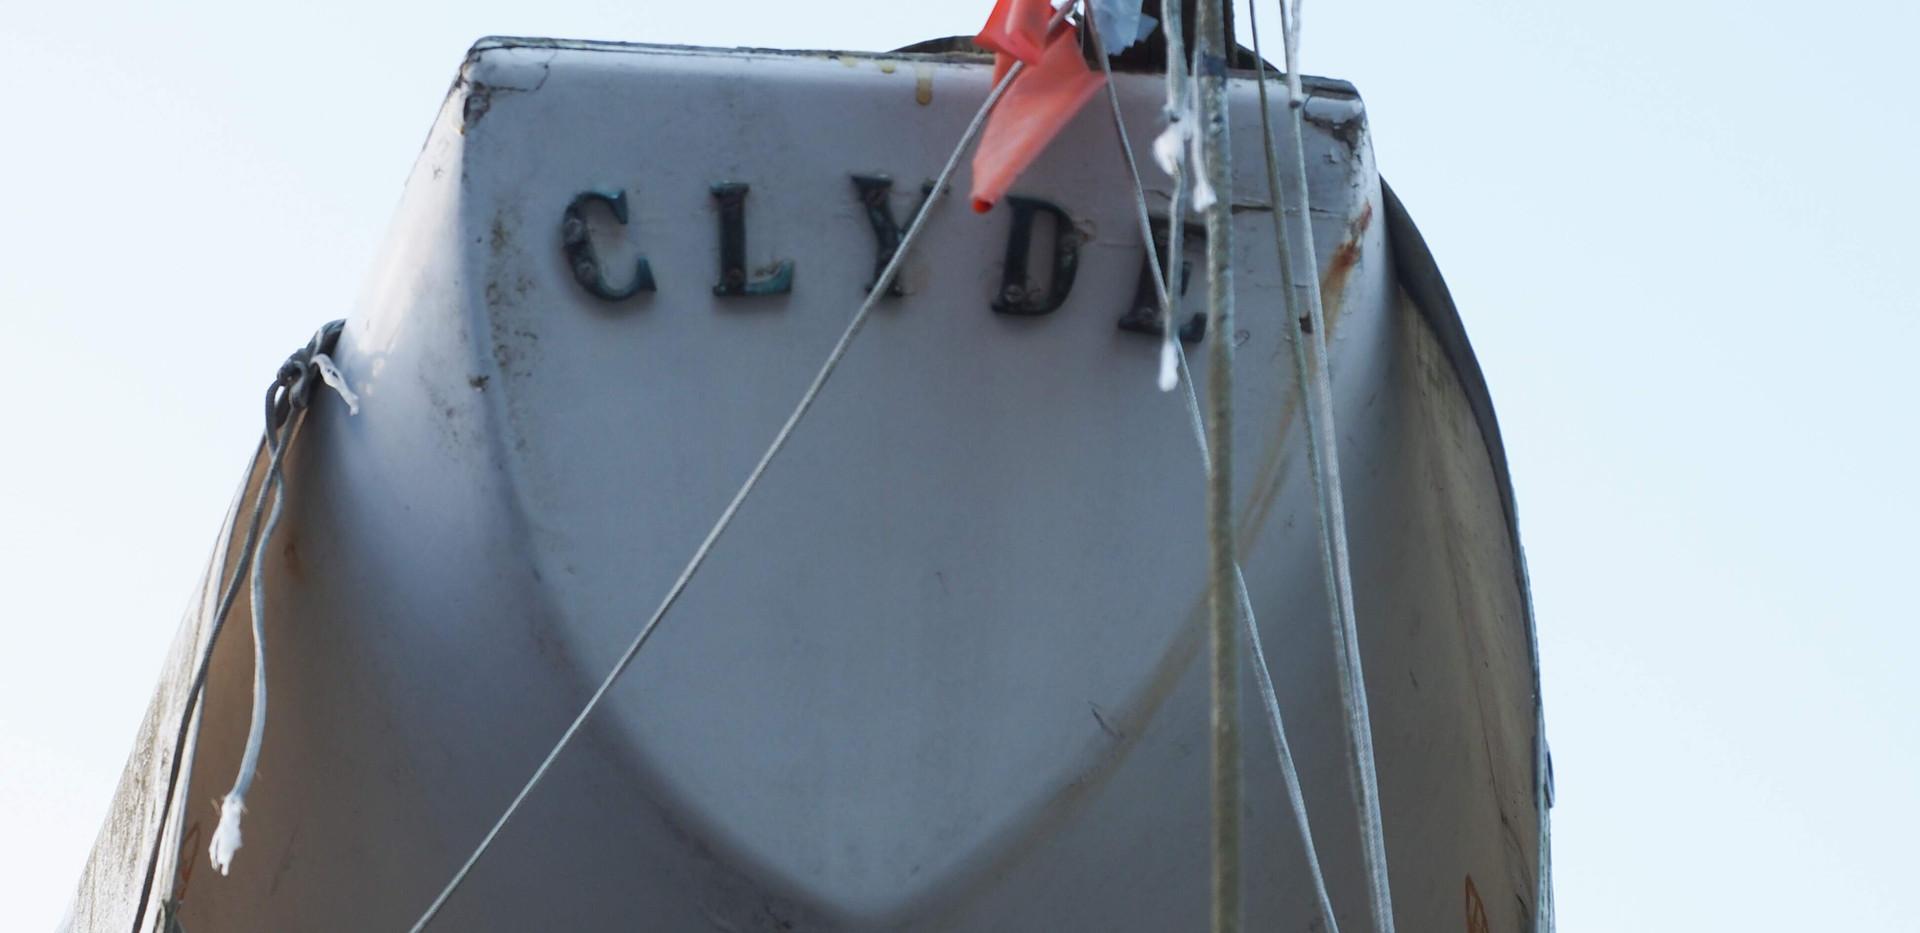 Clyde - Fife/McMillian 6 Metre